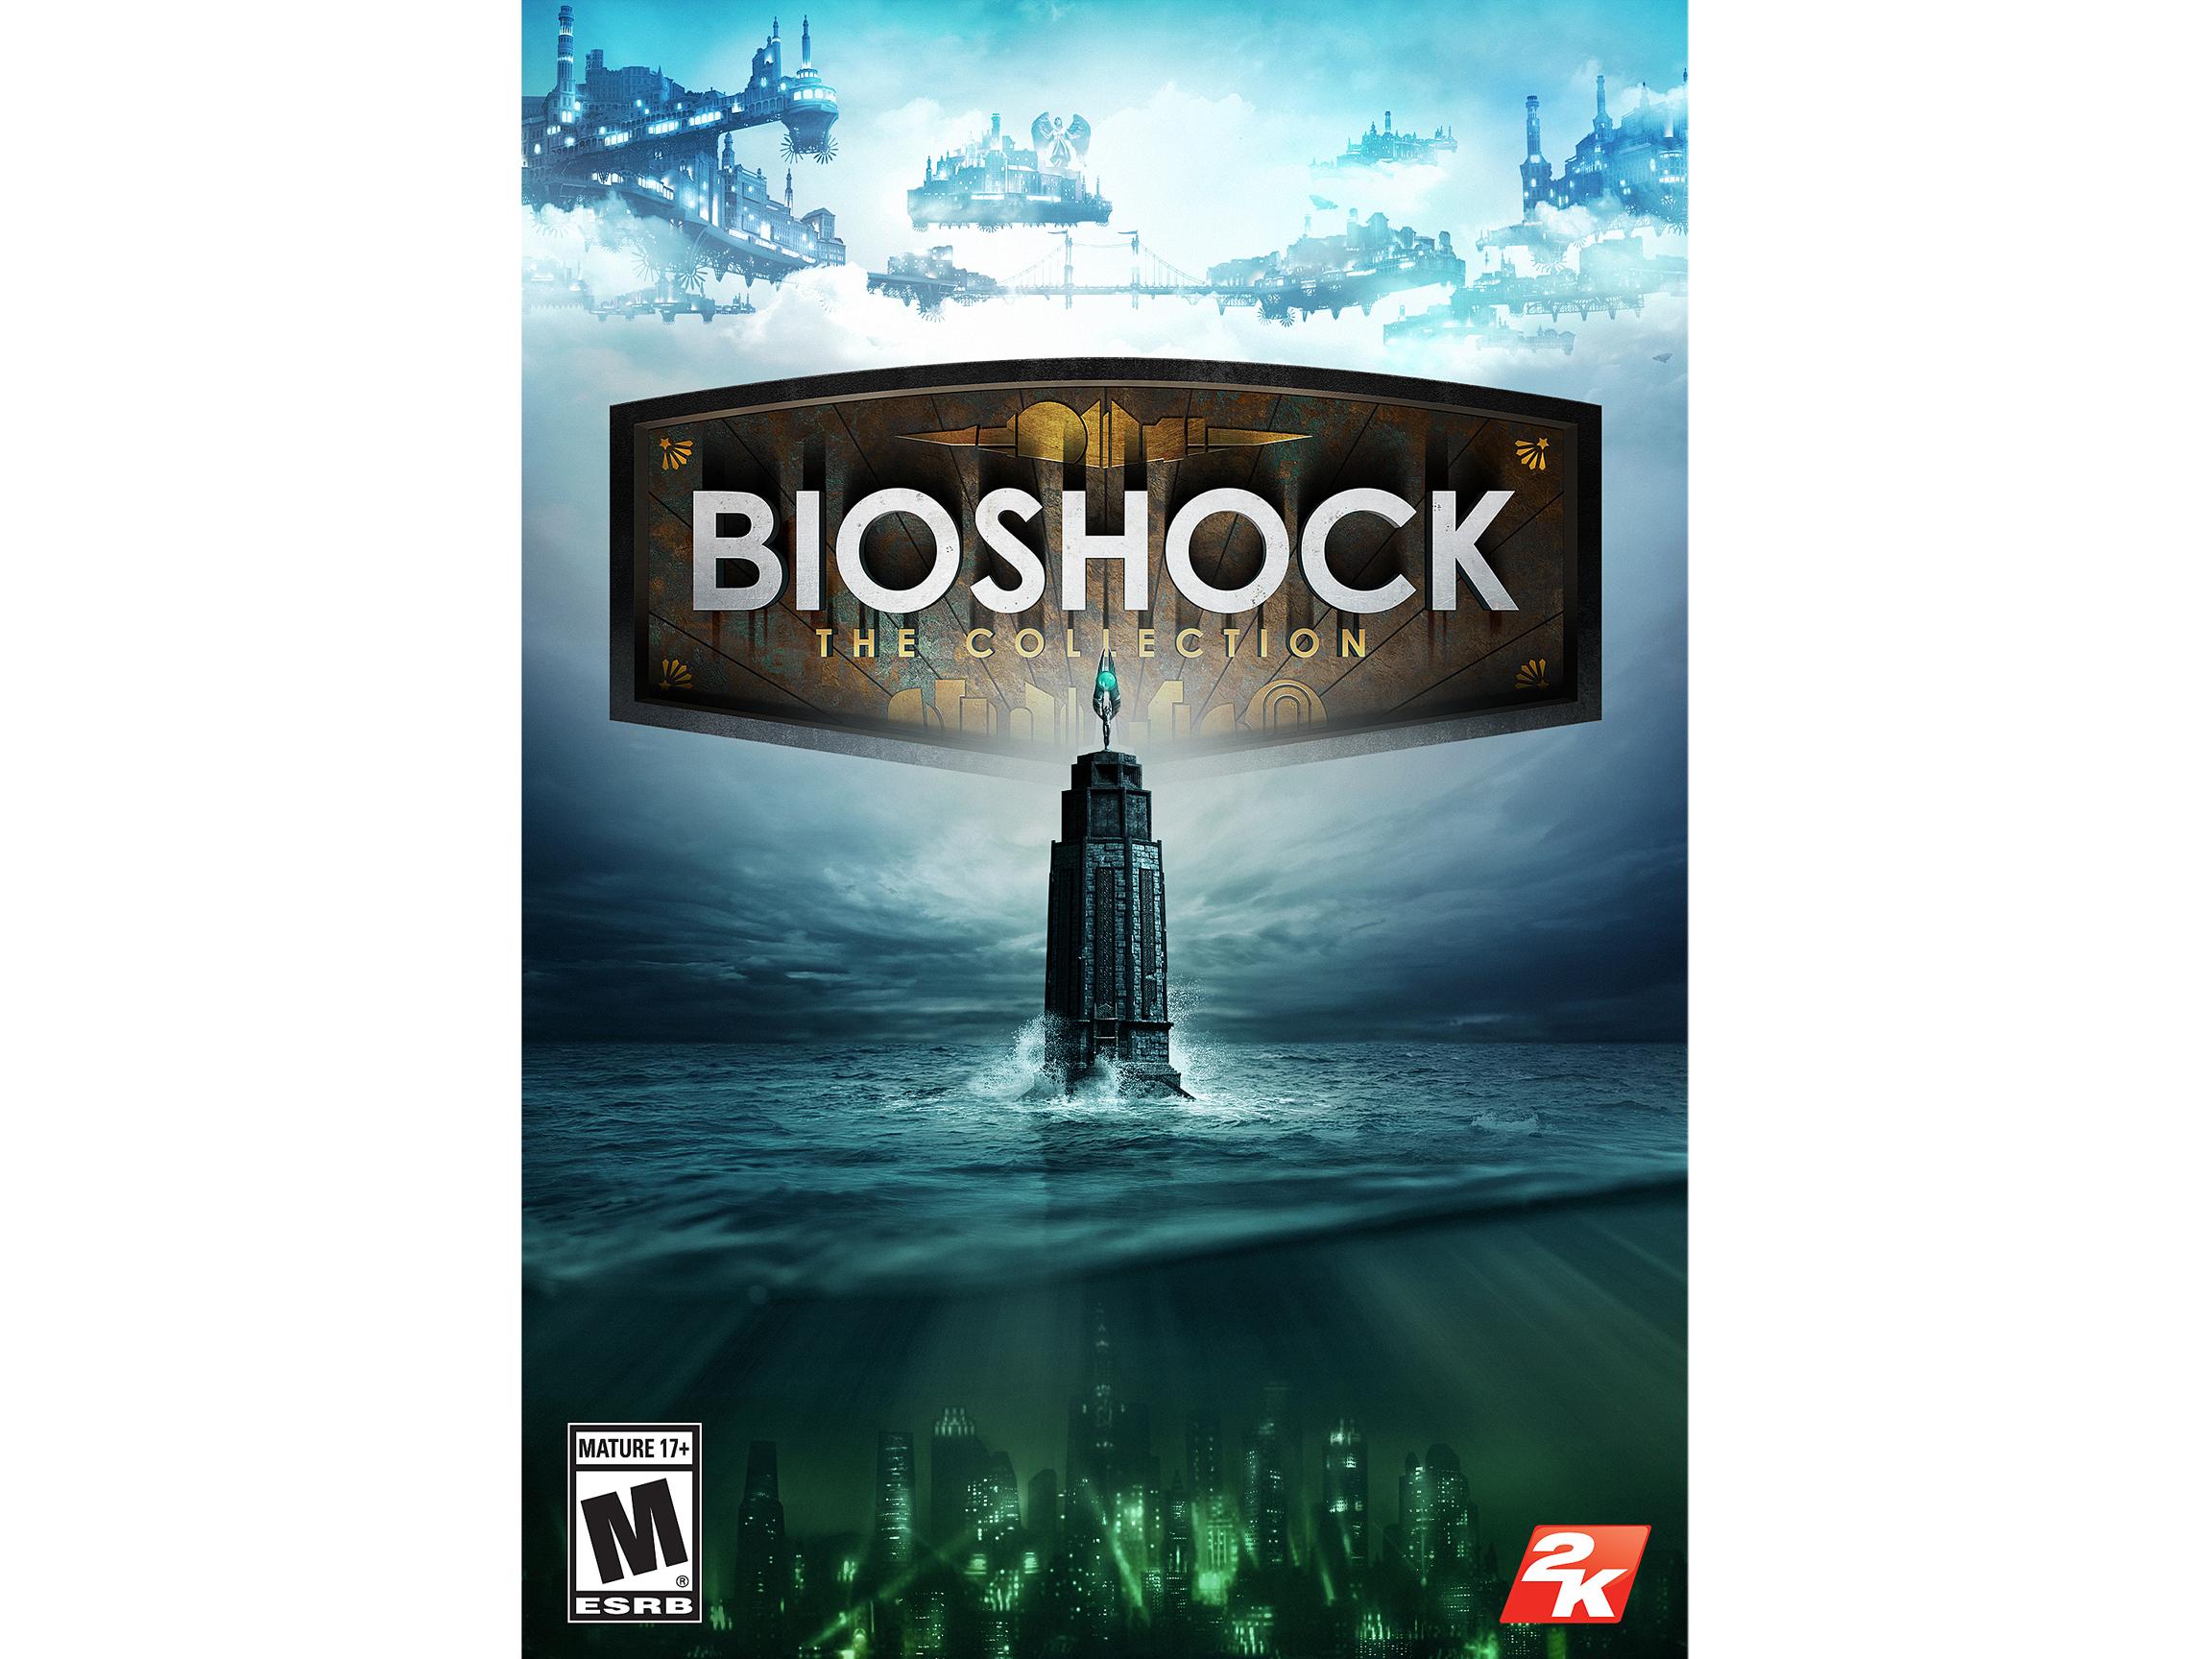 PC Digital Downloads: BioShock: The Collection, Sid Meier's Civilization VI, XCOM 2 $12.74 AC and More